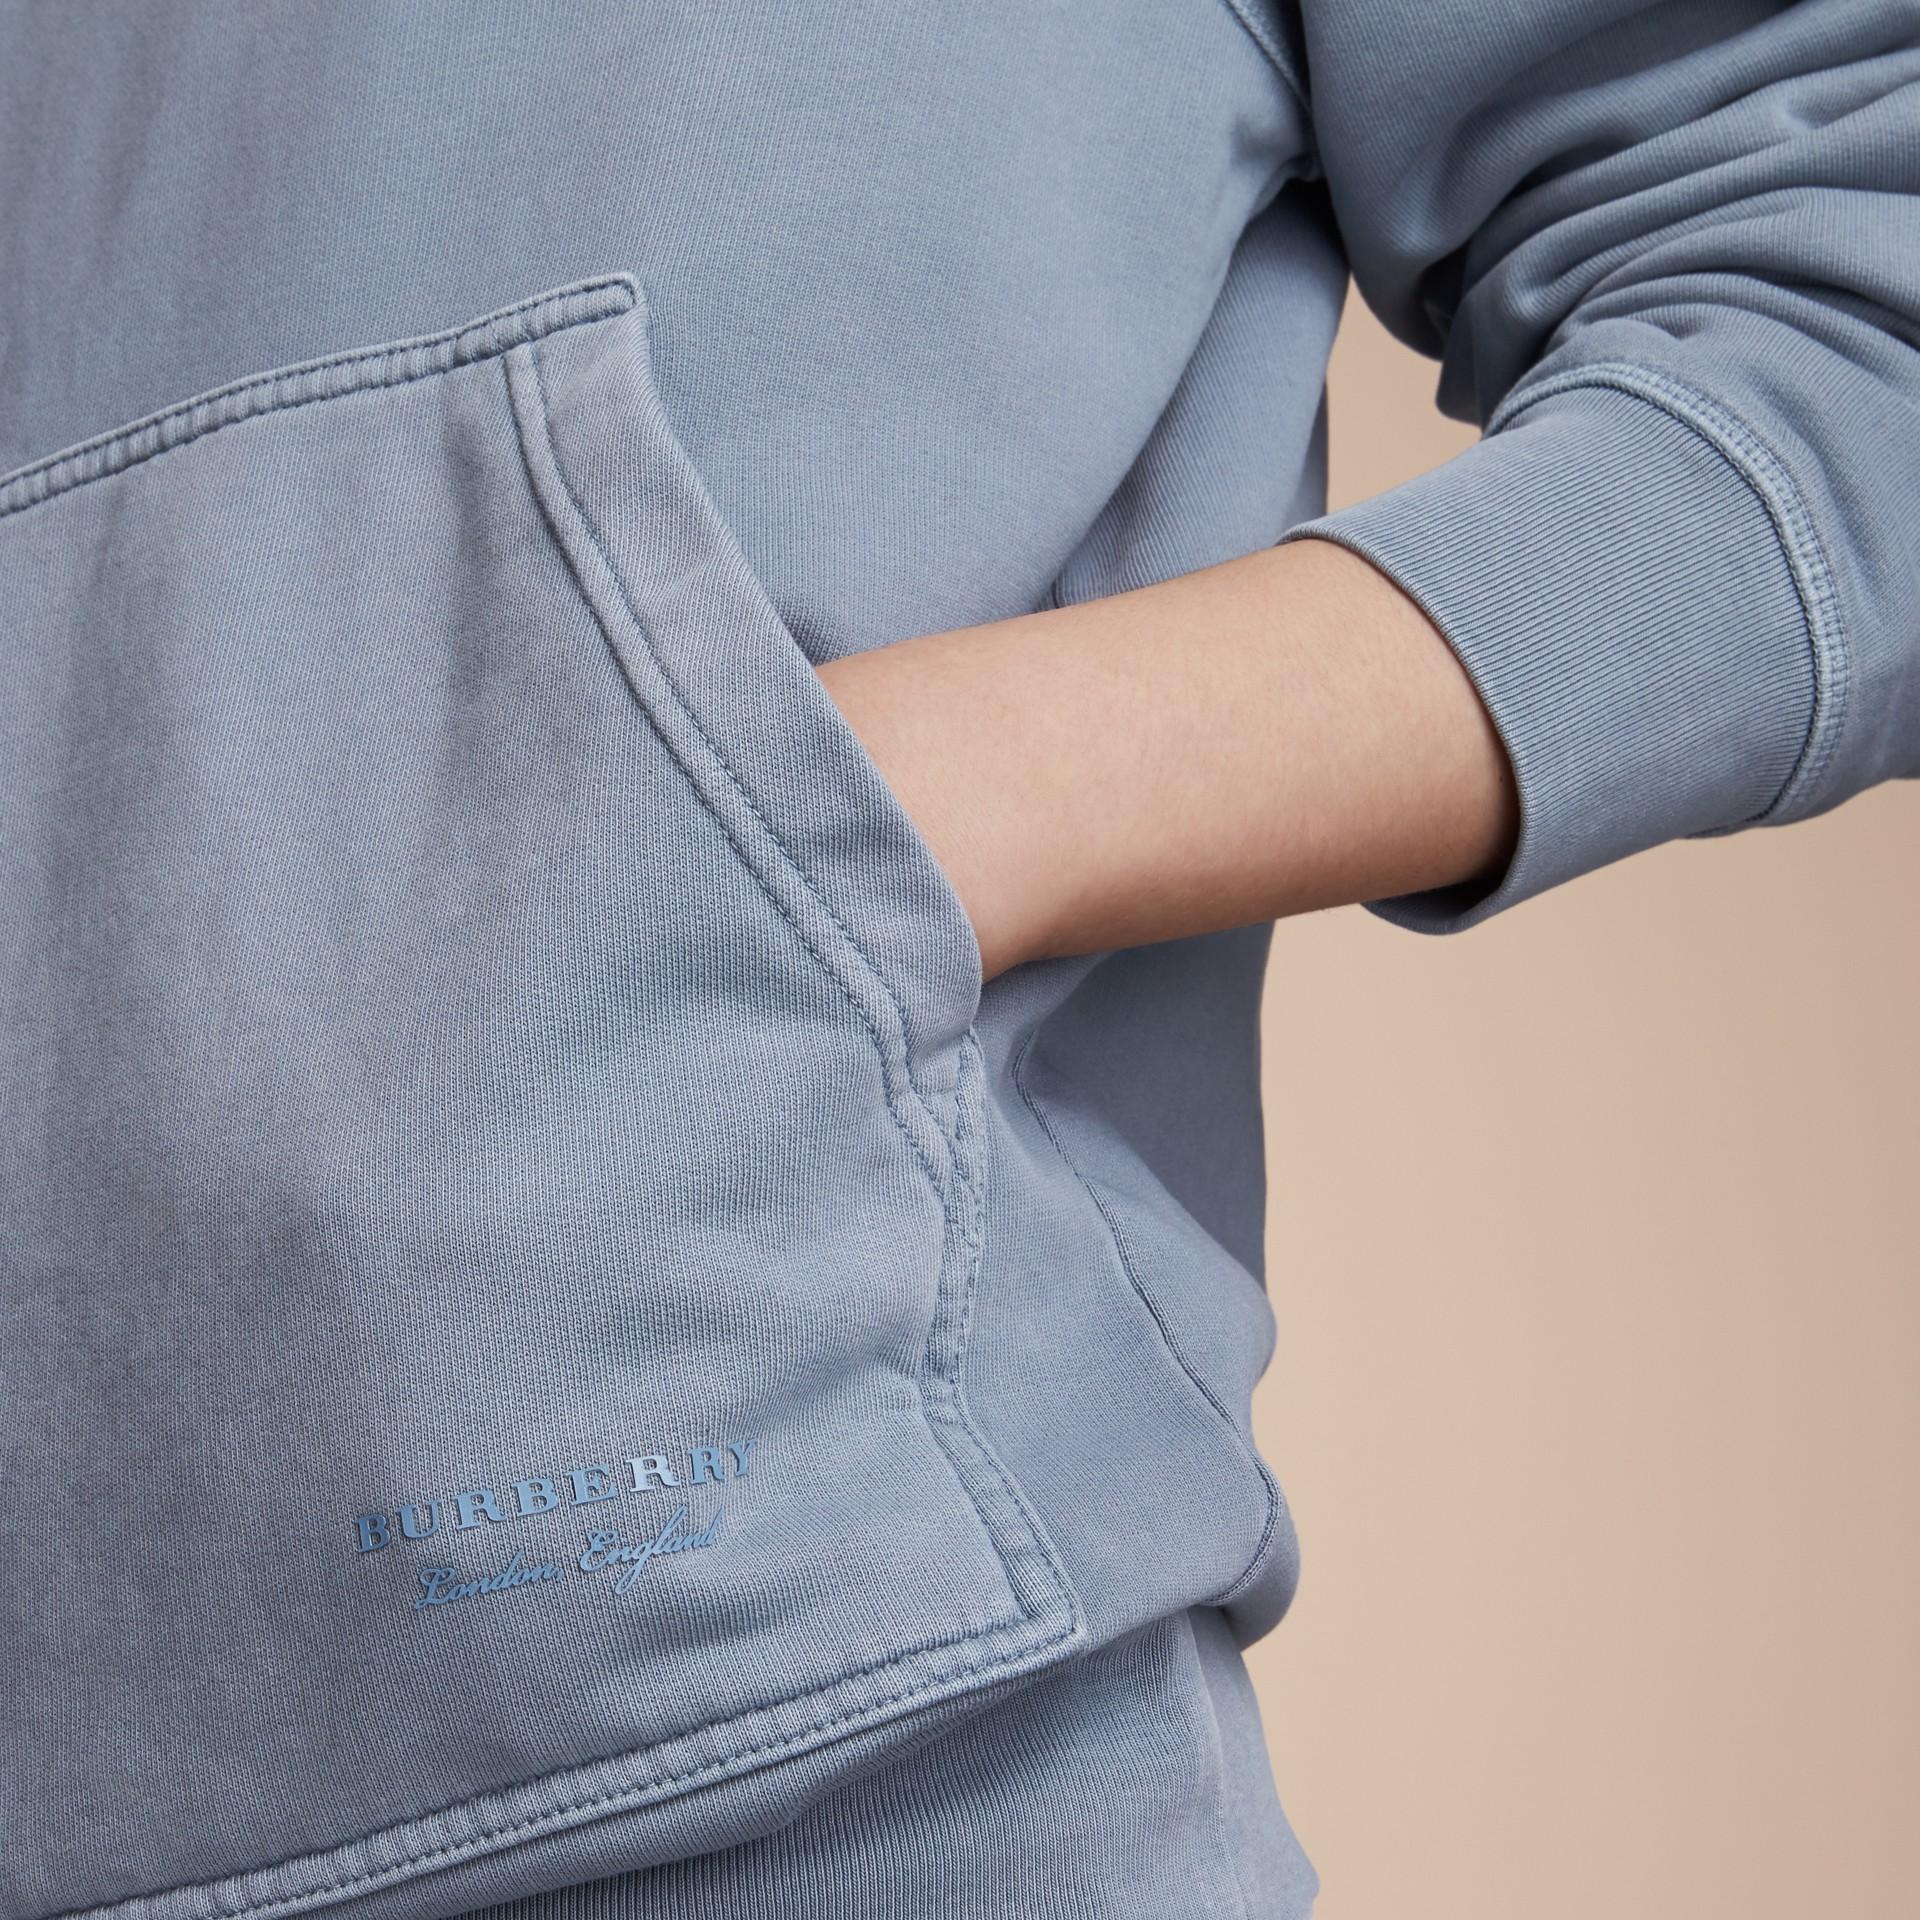 Unisex Pigment-dyed Cotton Oversize Sweatshirt in Dusty Blue - Women | Burberry Australia - gallery image 5